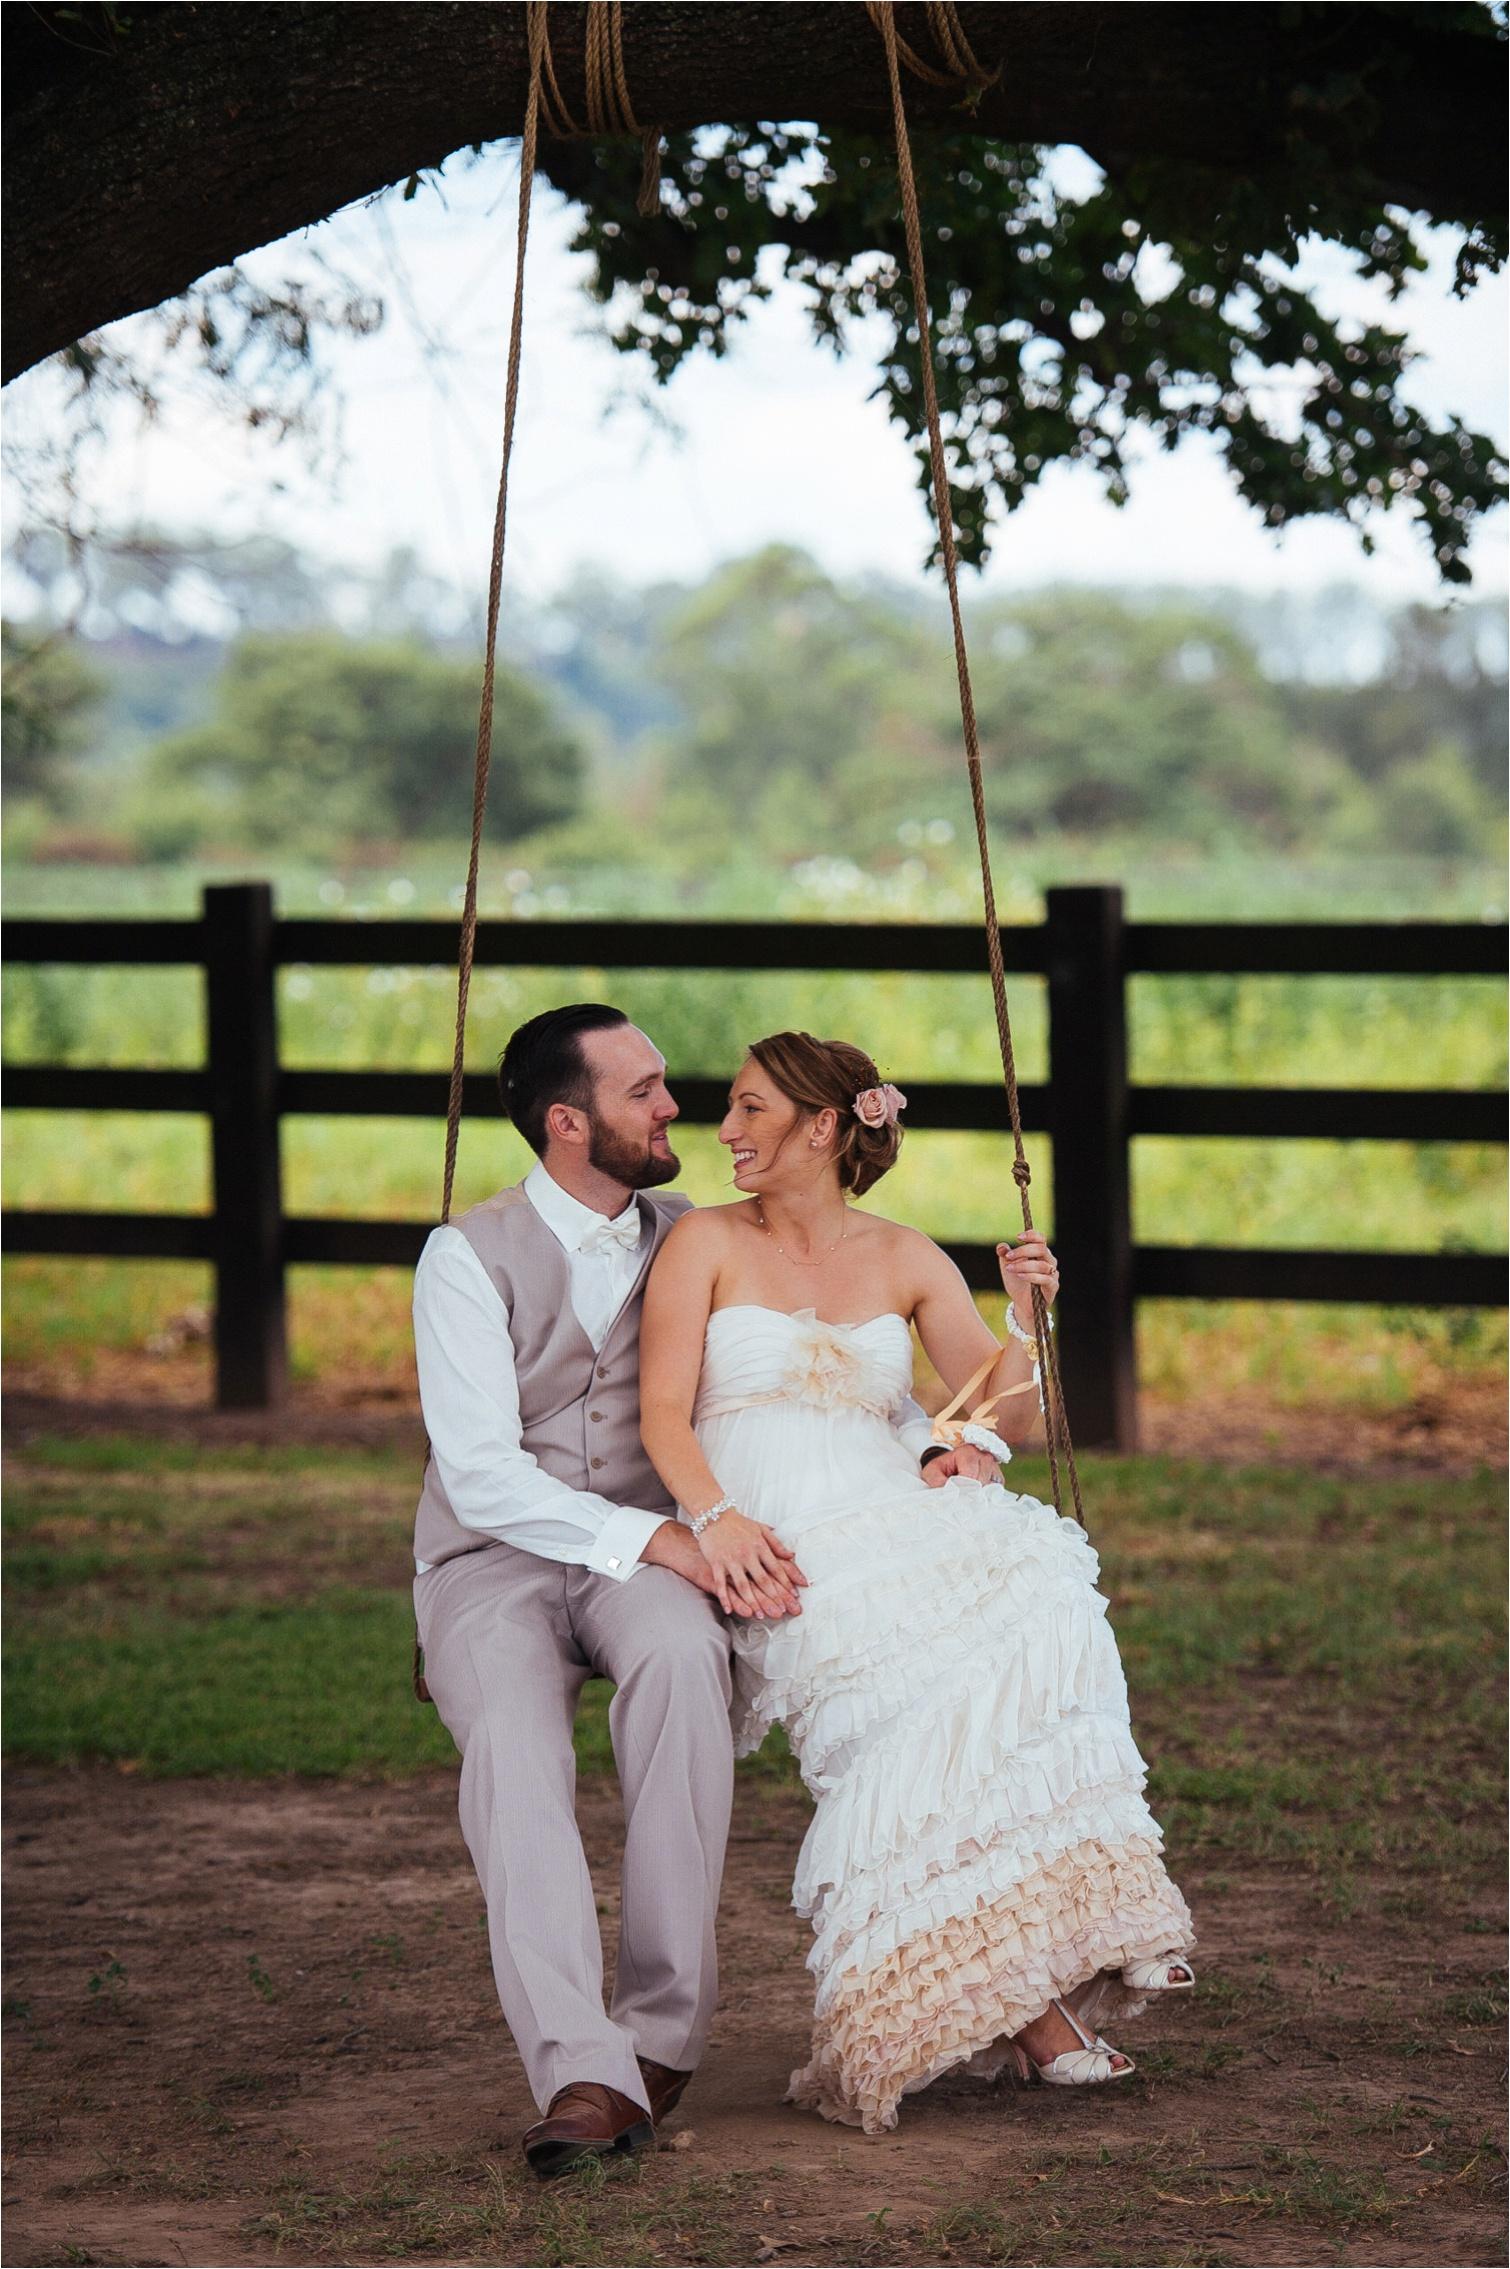 Jenny&Mitch_Sebel_Windsor_Sydney_Polo_Club_wedding-by_The_Follans_Gold_Coast_Wedding_Photographers_0058.jpg